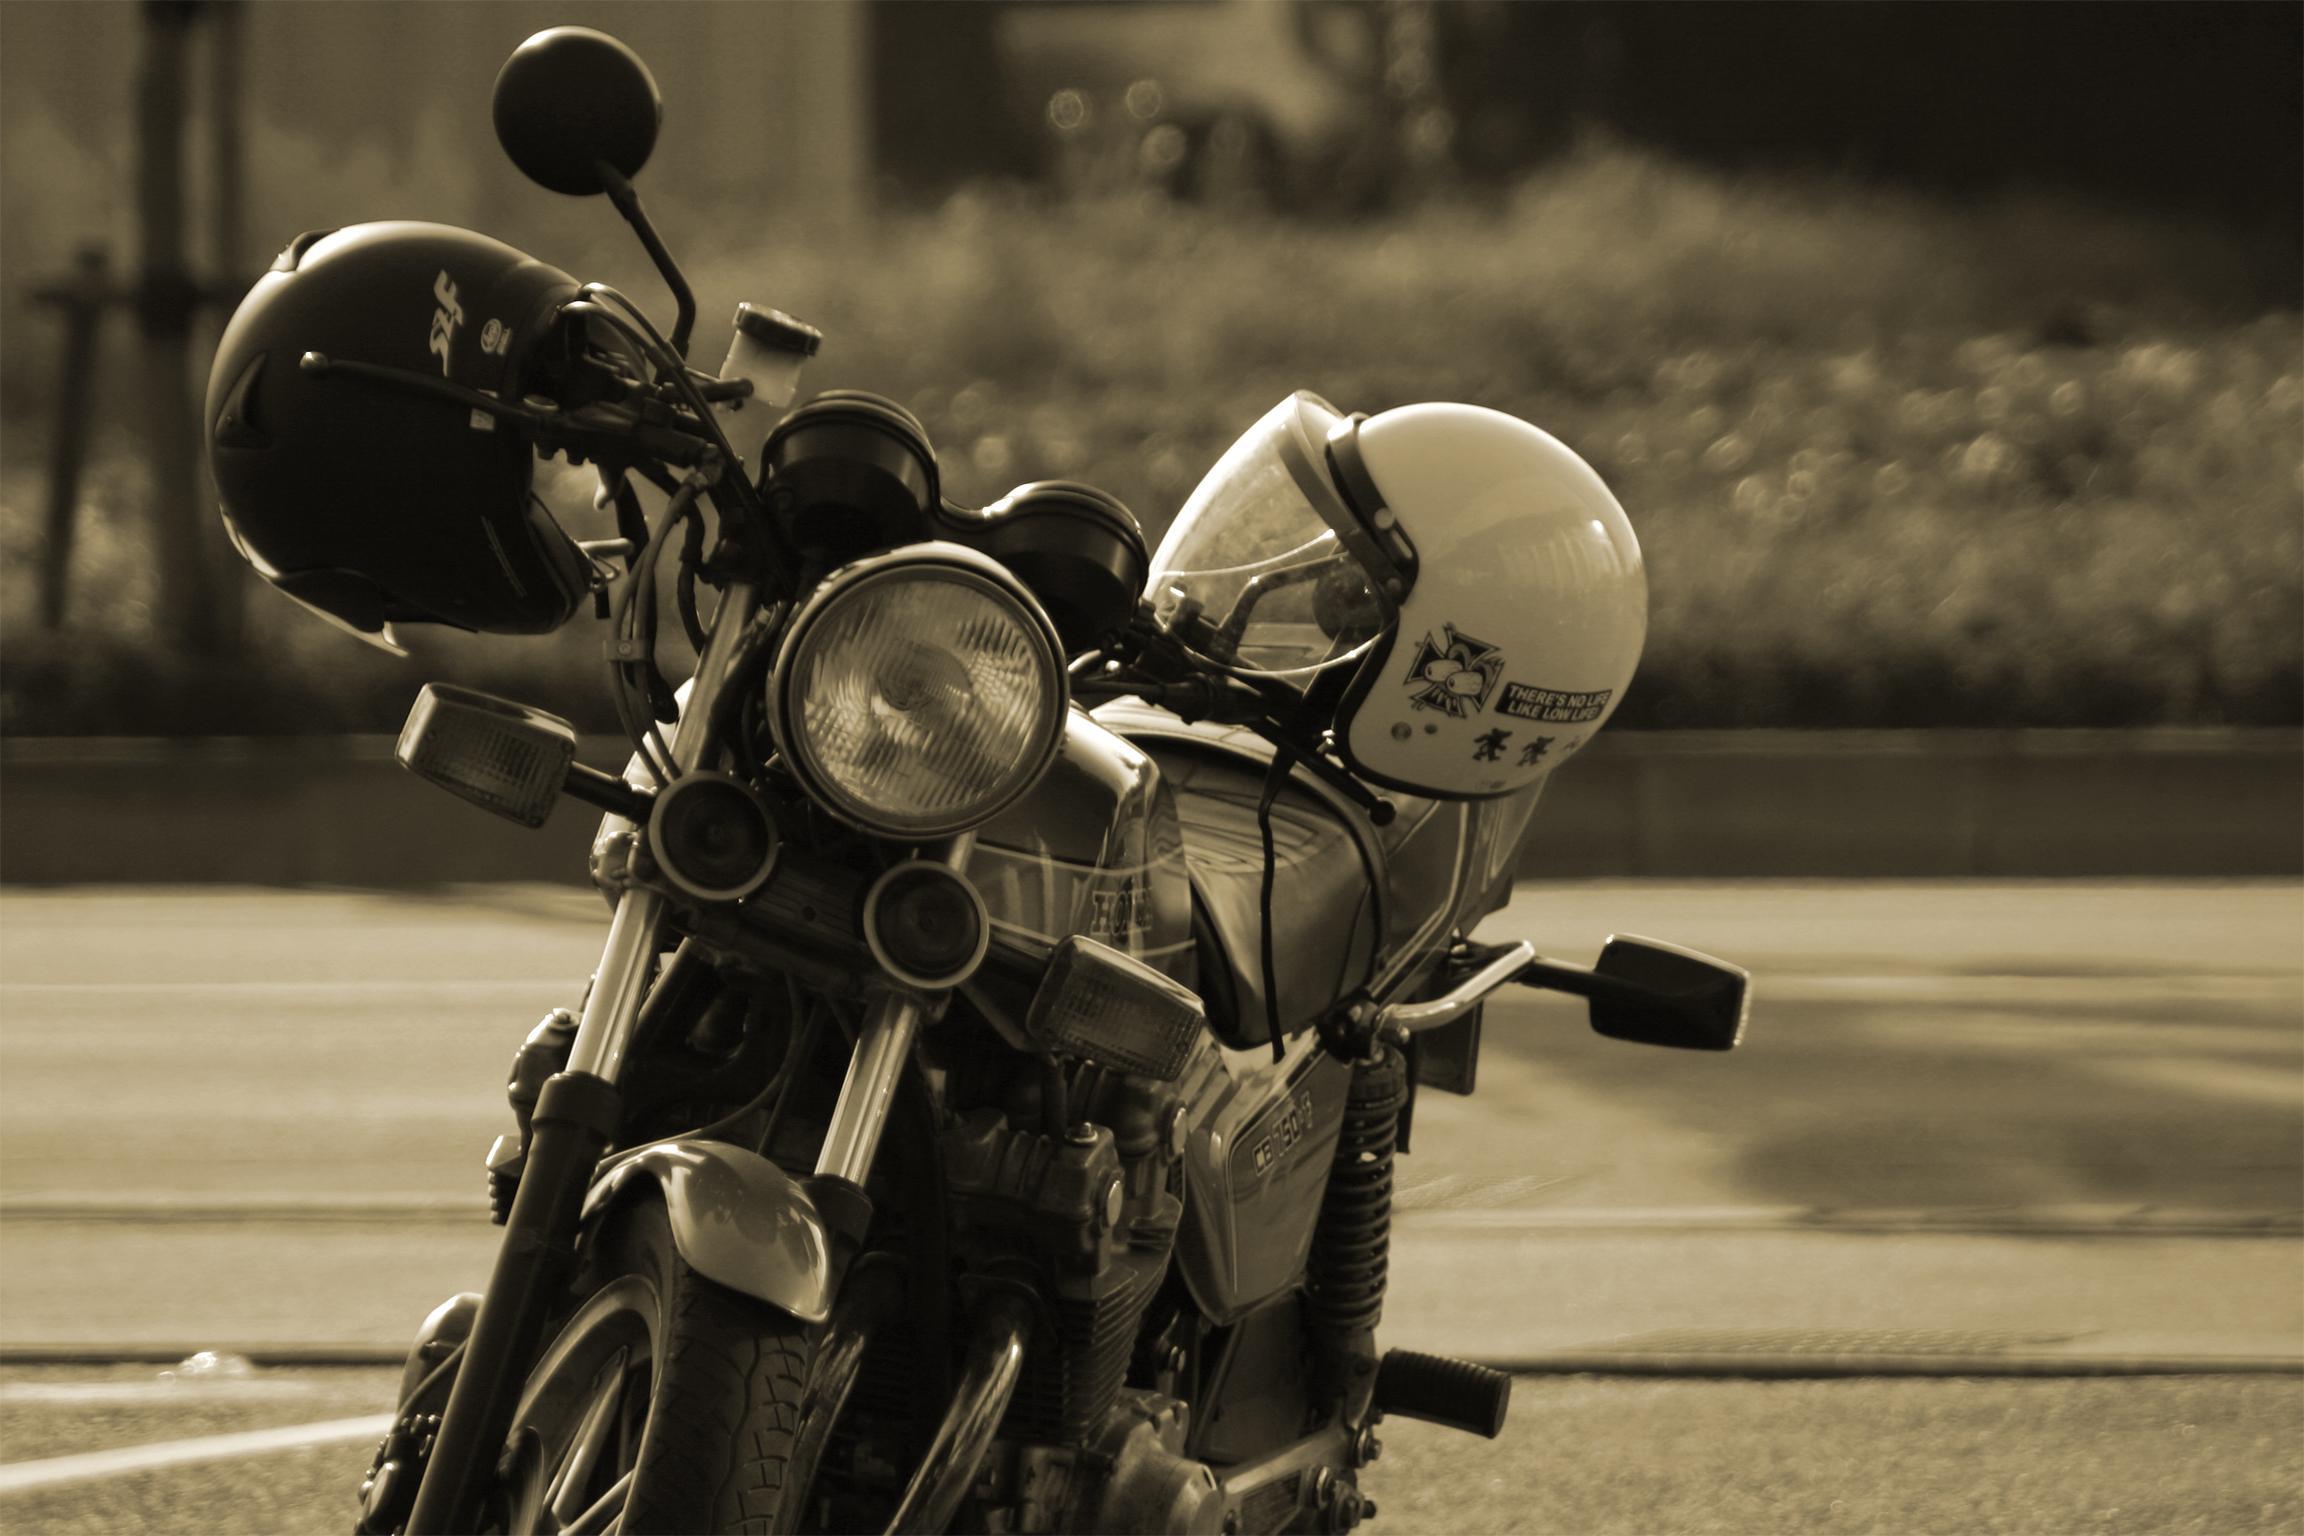 Motorcycle Sepia